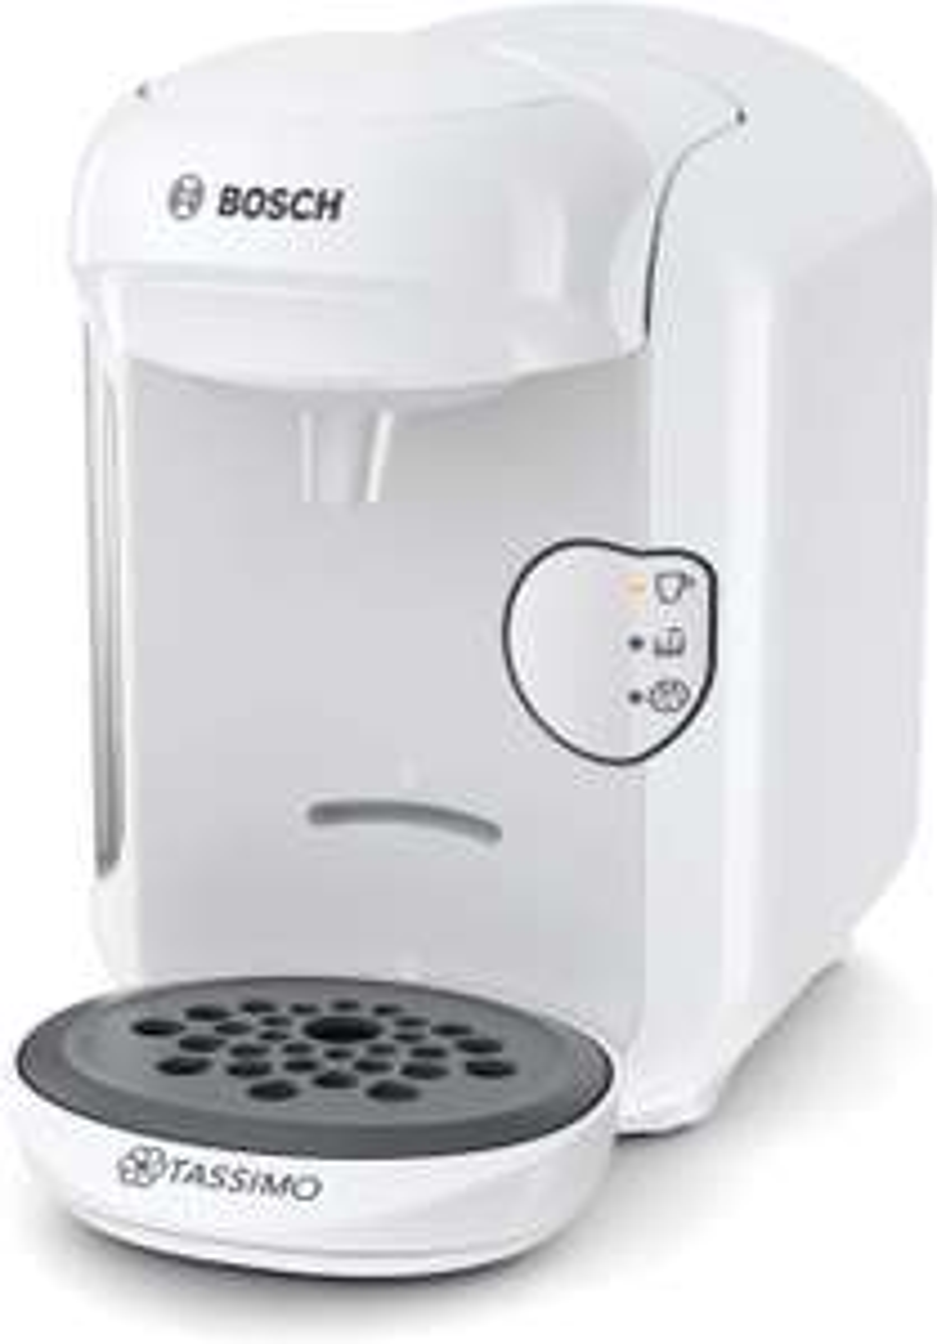 Machine à Café Bosch Tassimo TAS1404 - Blanc, 1300 W, 0,7 L